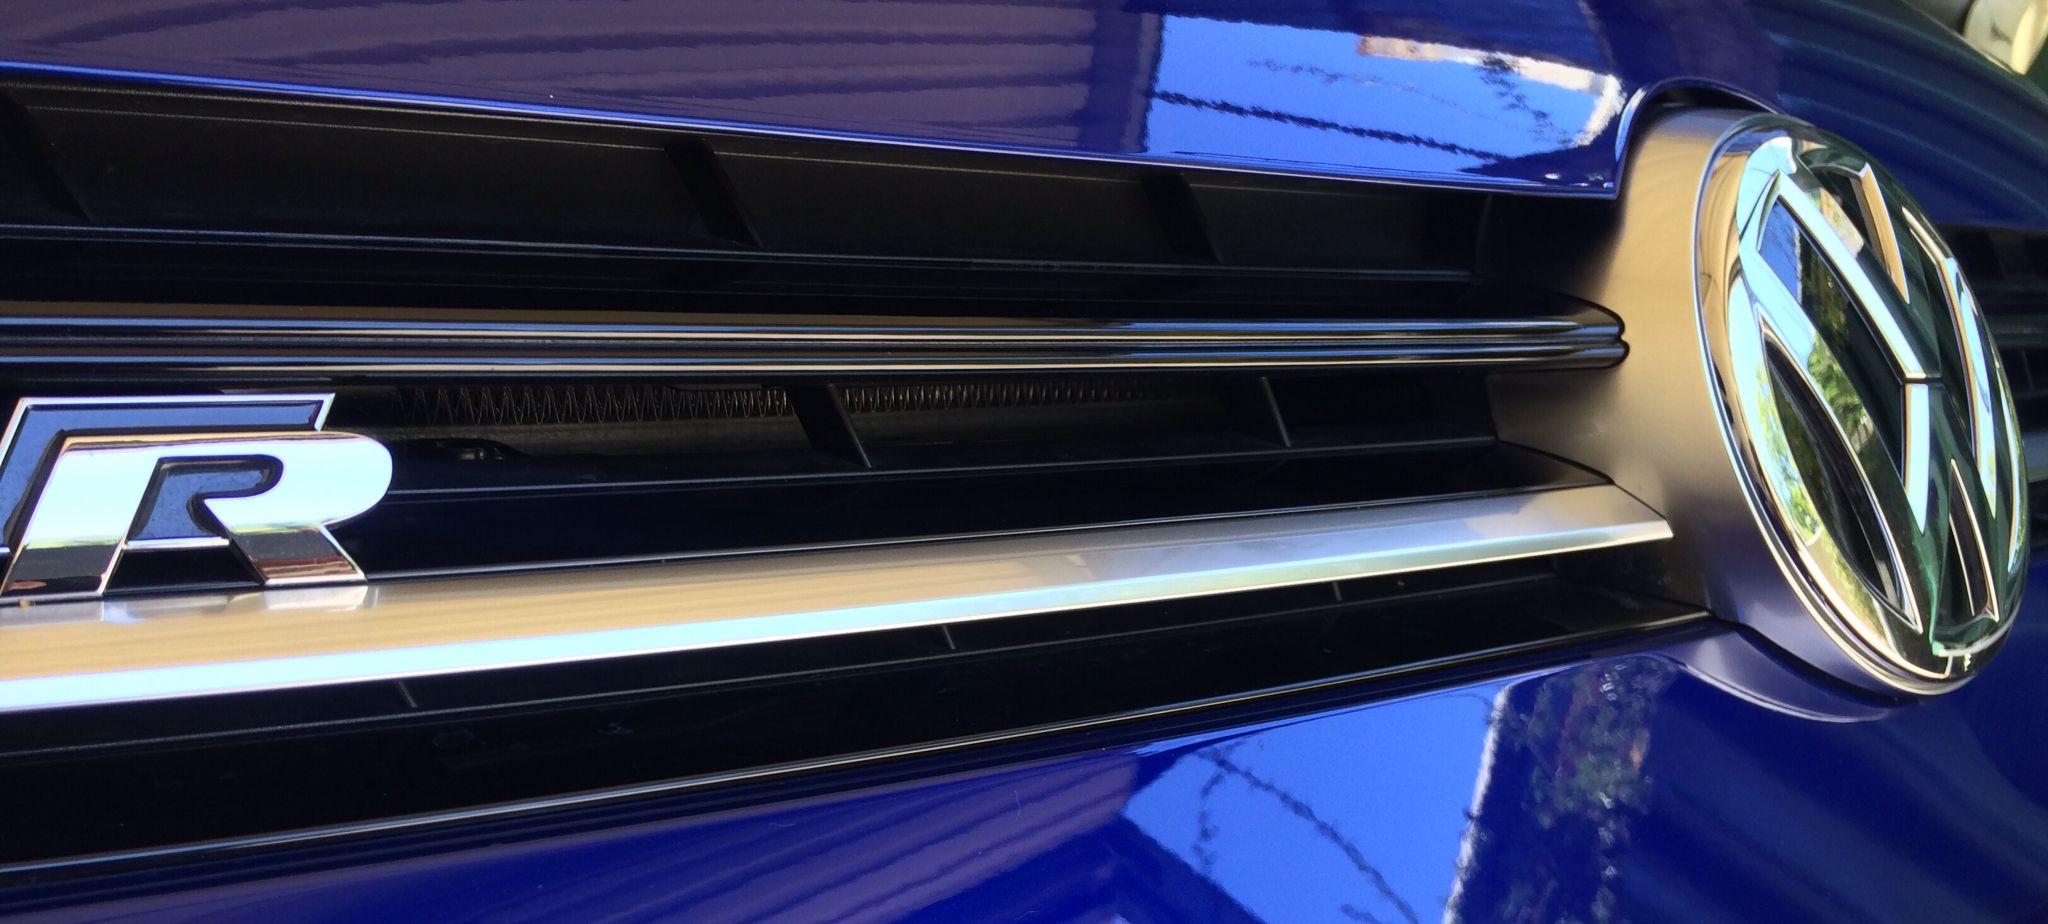 Rose Gold Mini Cooper Vinyl Car Wrap Car Wraps in